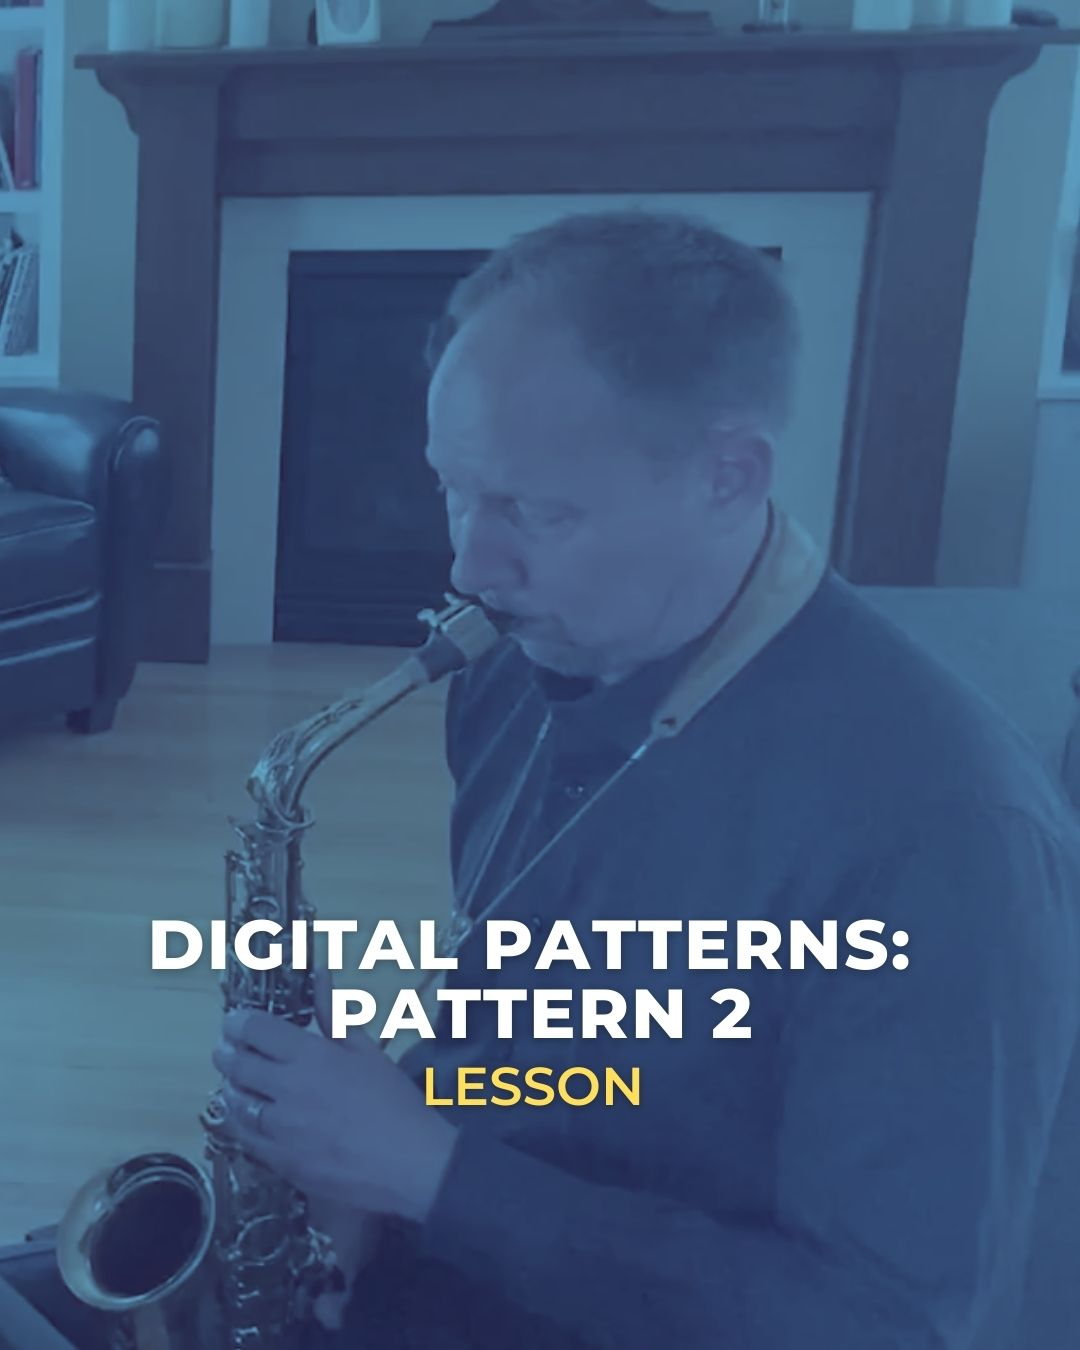 Digital Pattern 2